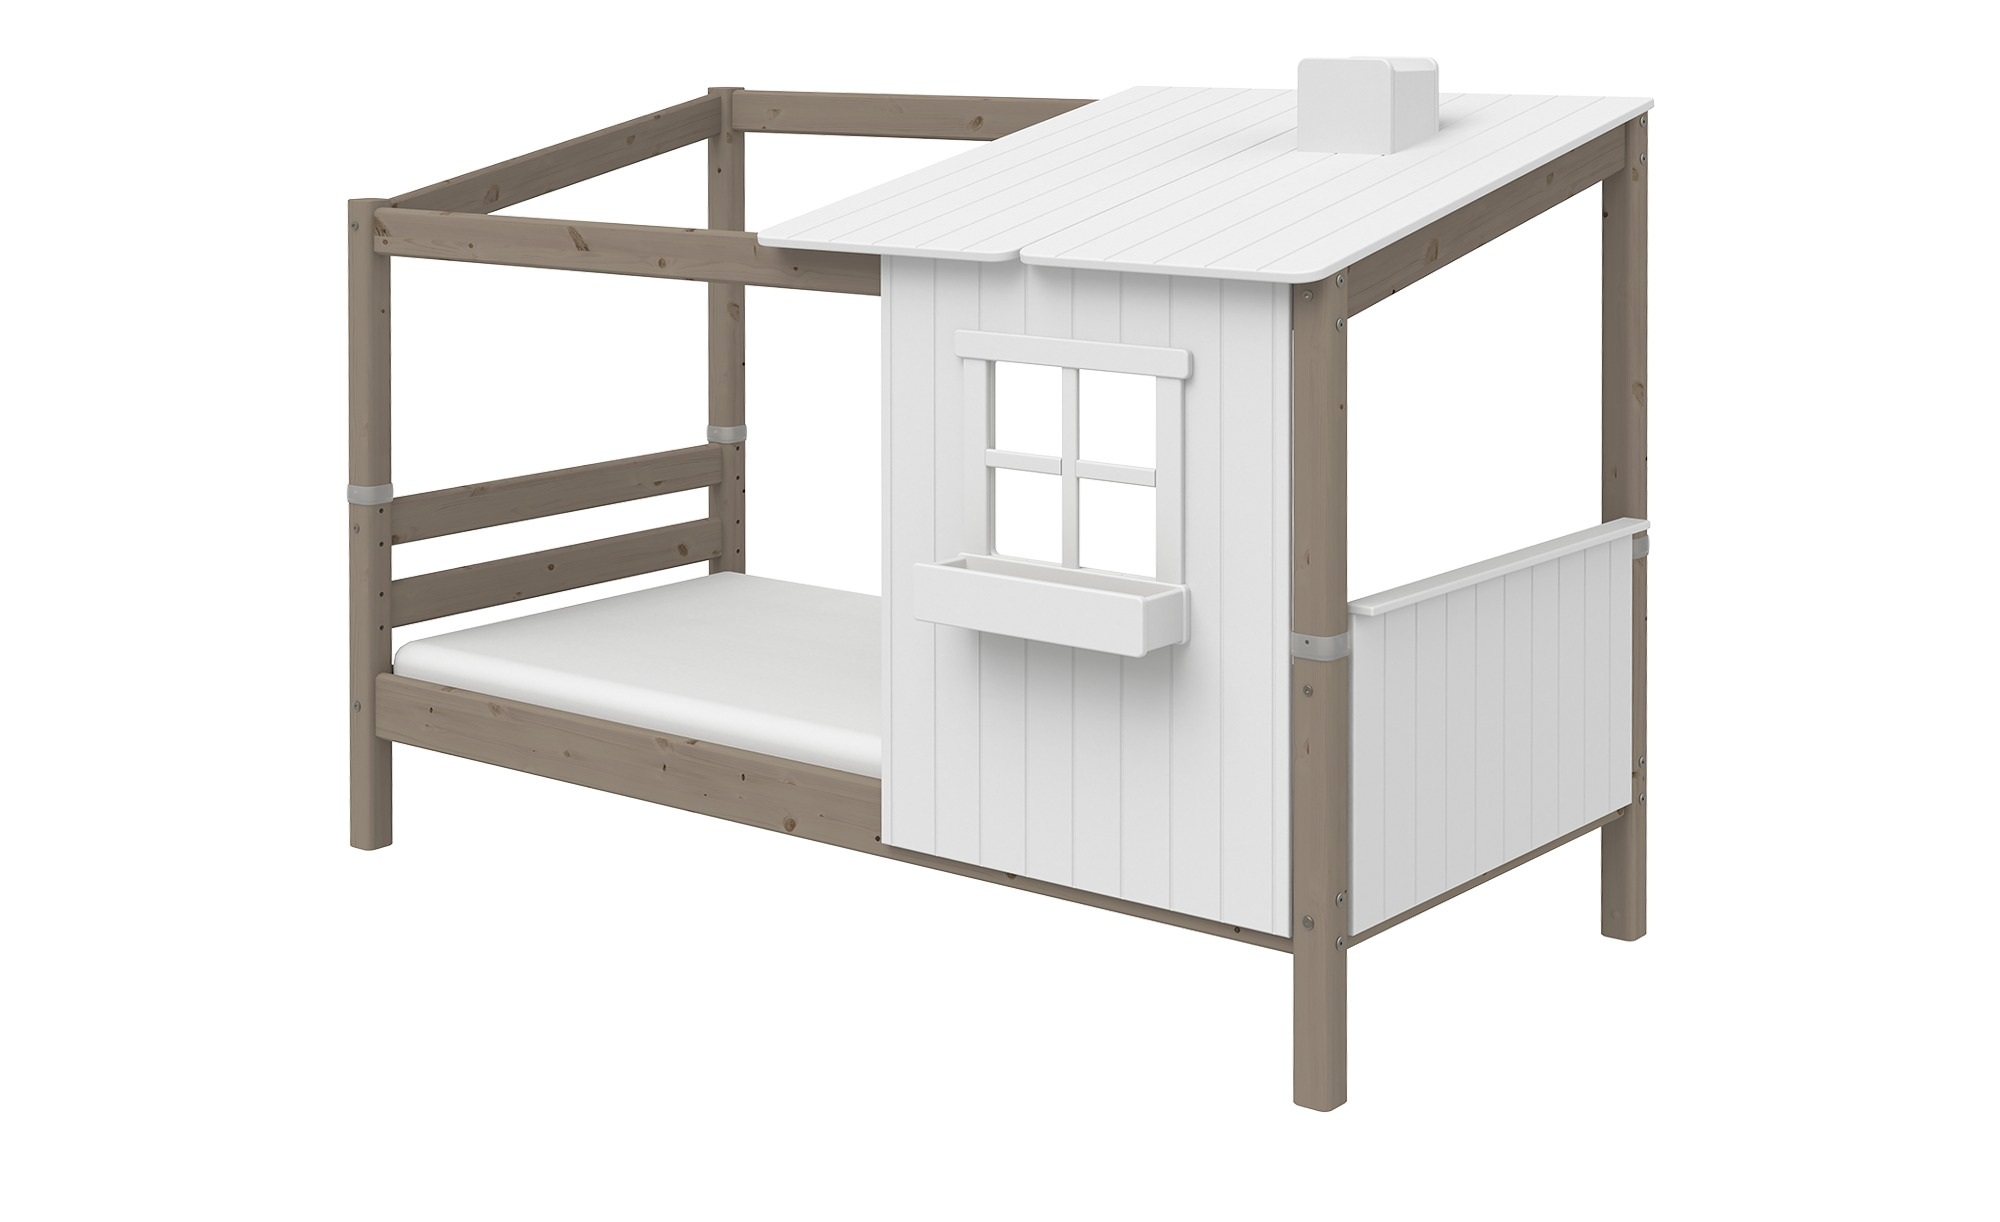 FLEXA Bettgestell  Flexa Classic Haus - holzfarben - 112 cm - 154 cm - Jugendmöbel > Jugendbetten - Möbel Kraft | Kinderzimmer > Jugendzimmer > Jugendbetten | FLEXA